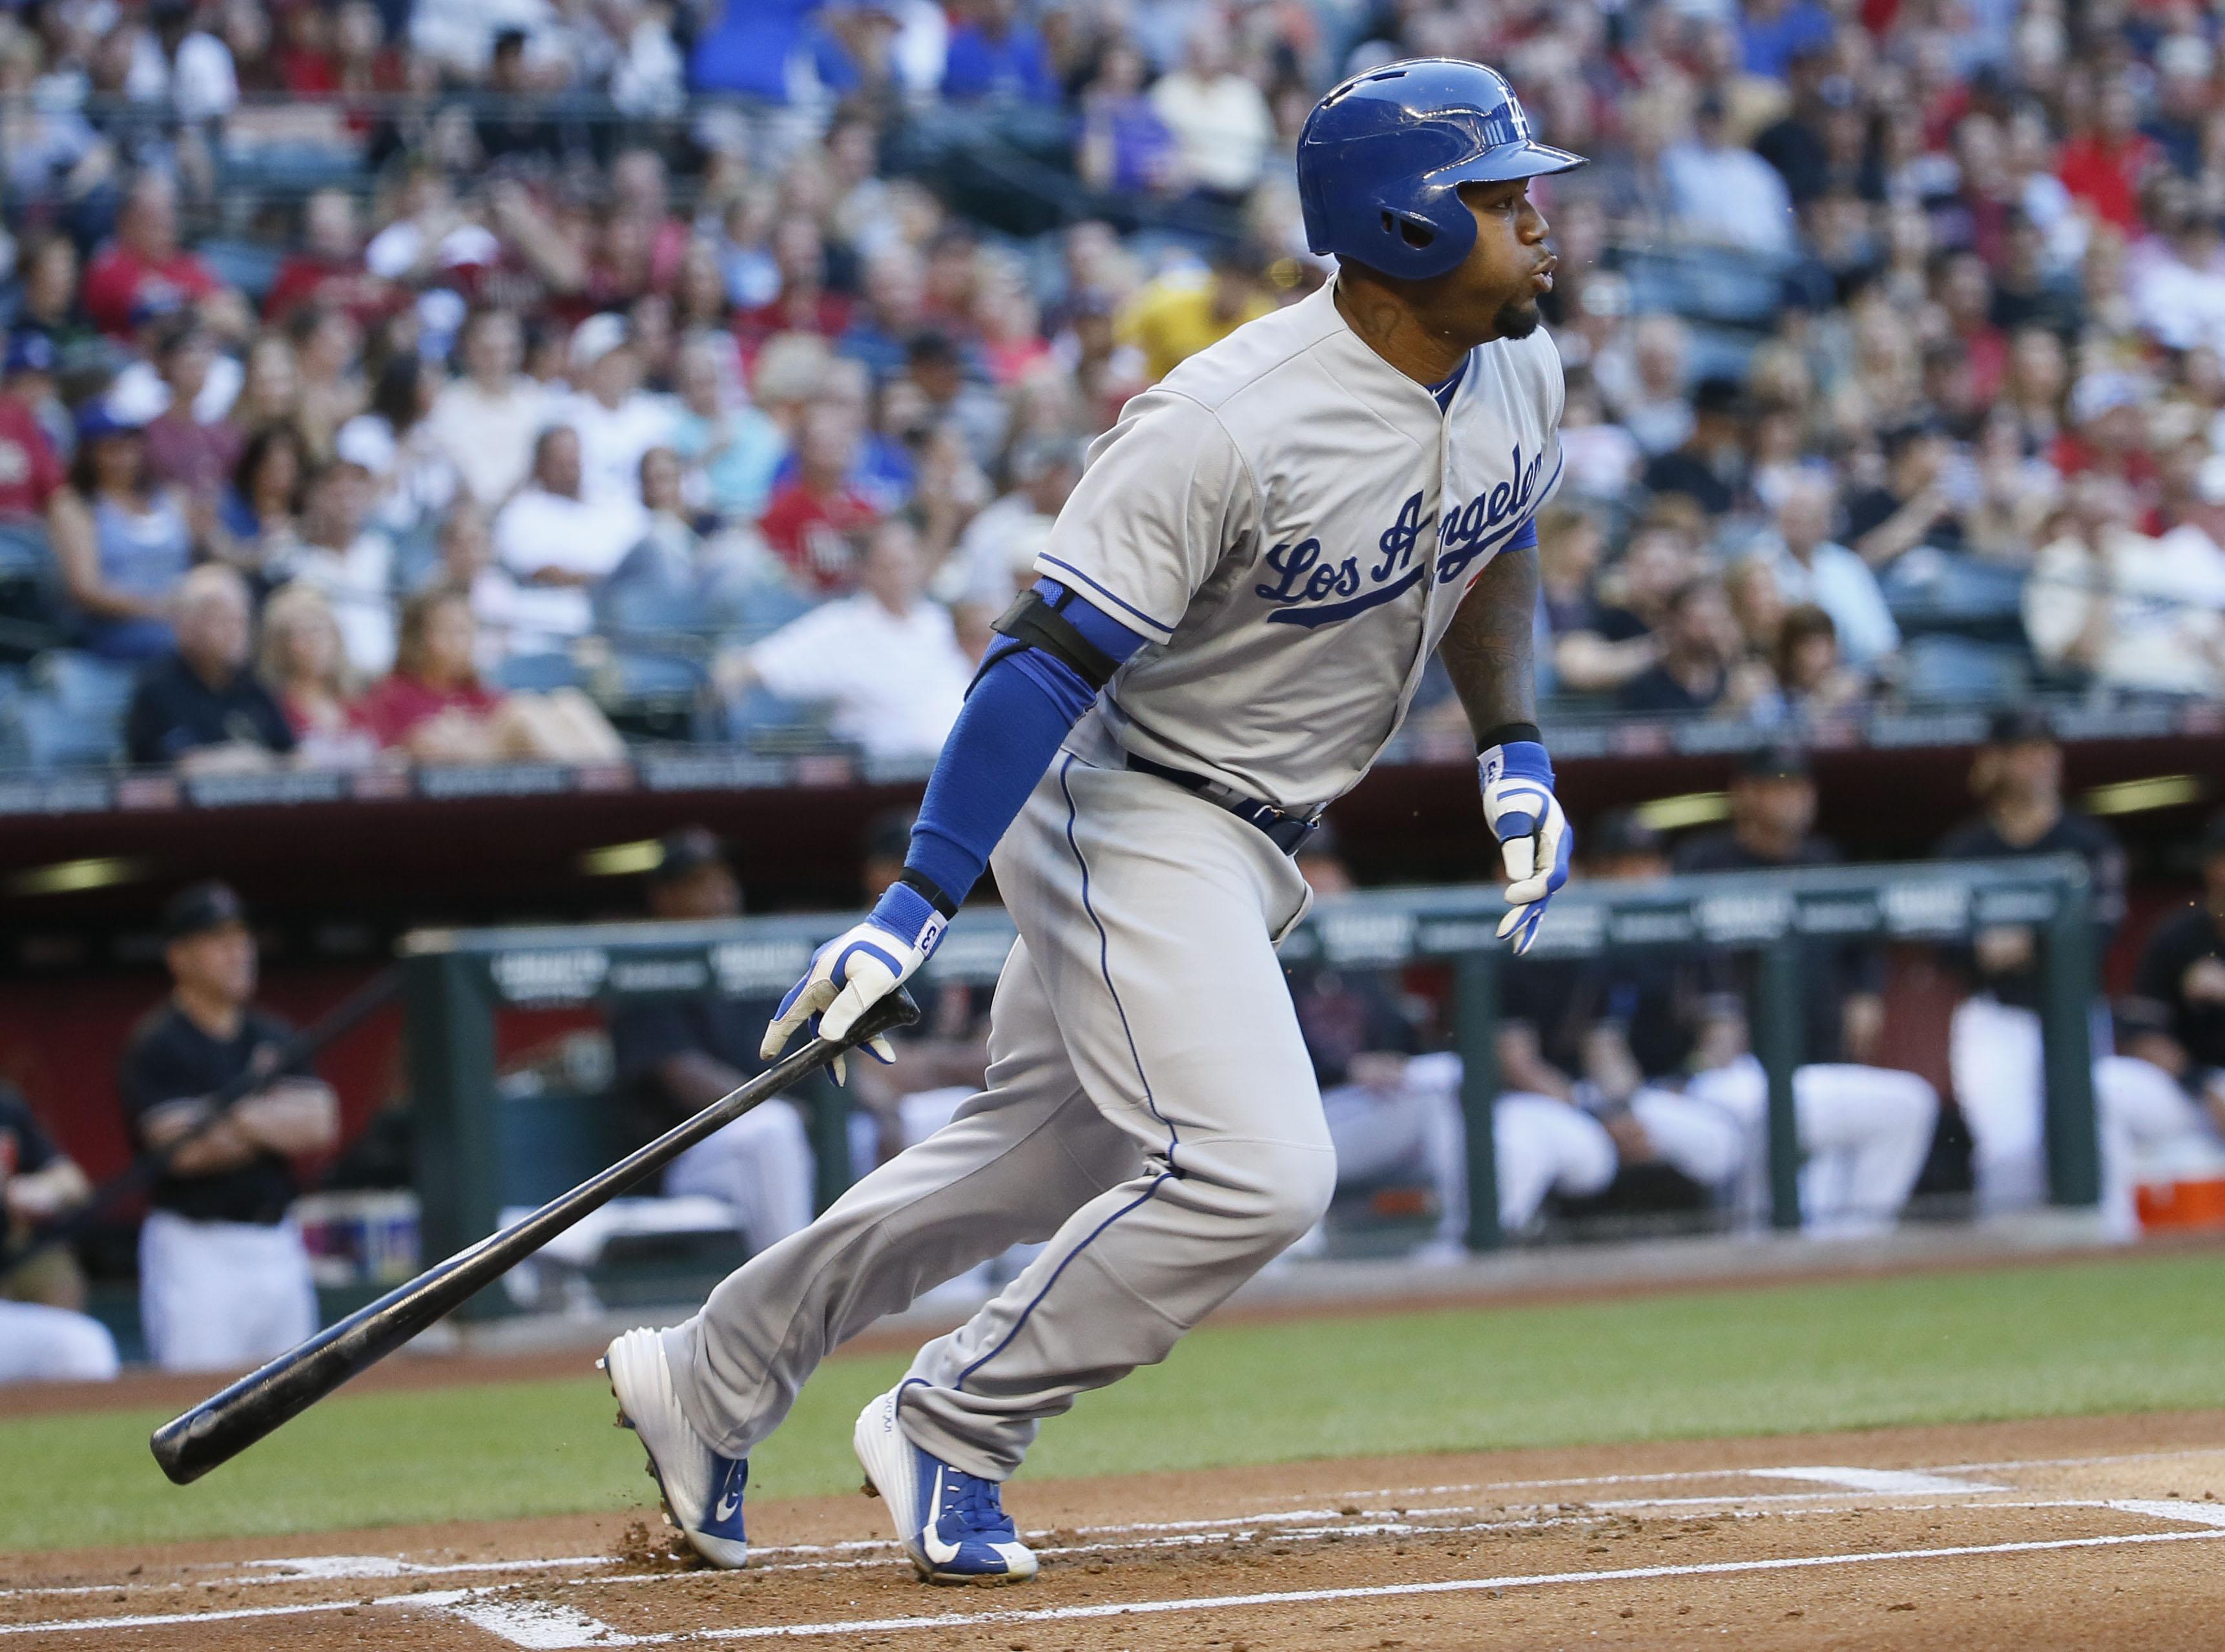 Los Angeles Dodgers Carl Crawford hits against the Arizona Diamondbacks during the first inning of a MLB baseball game, Saturday, April 11, 2015, in Phoenix. (AP Photo/Matt York)